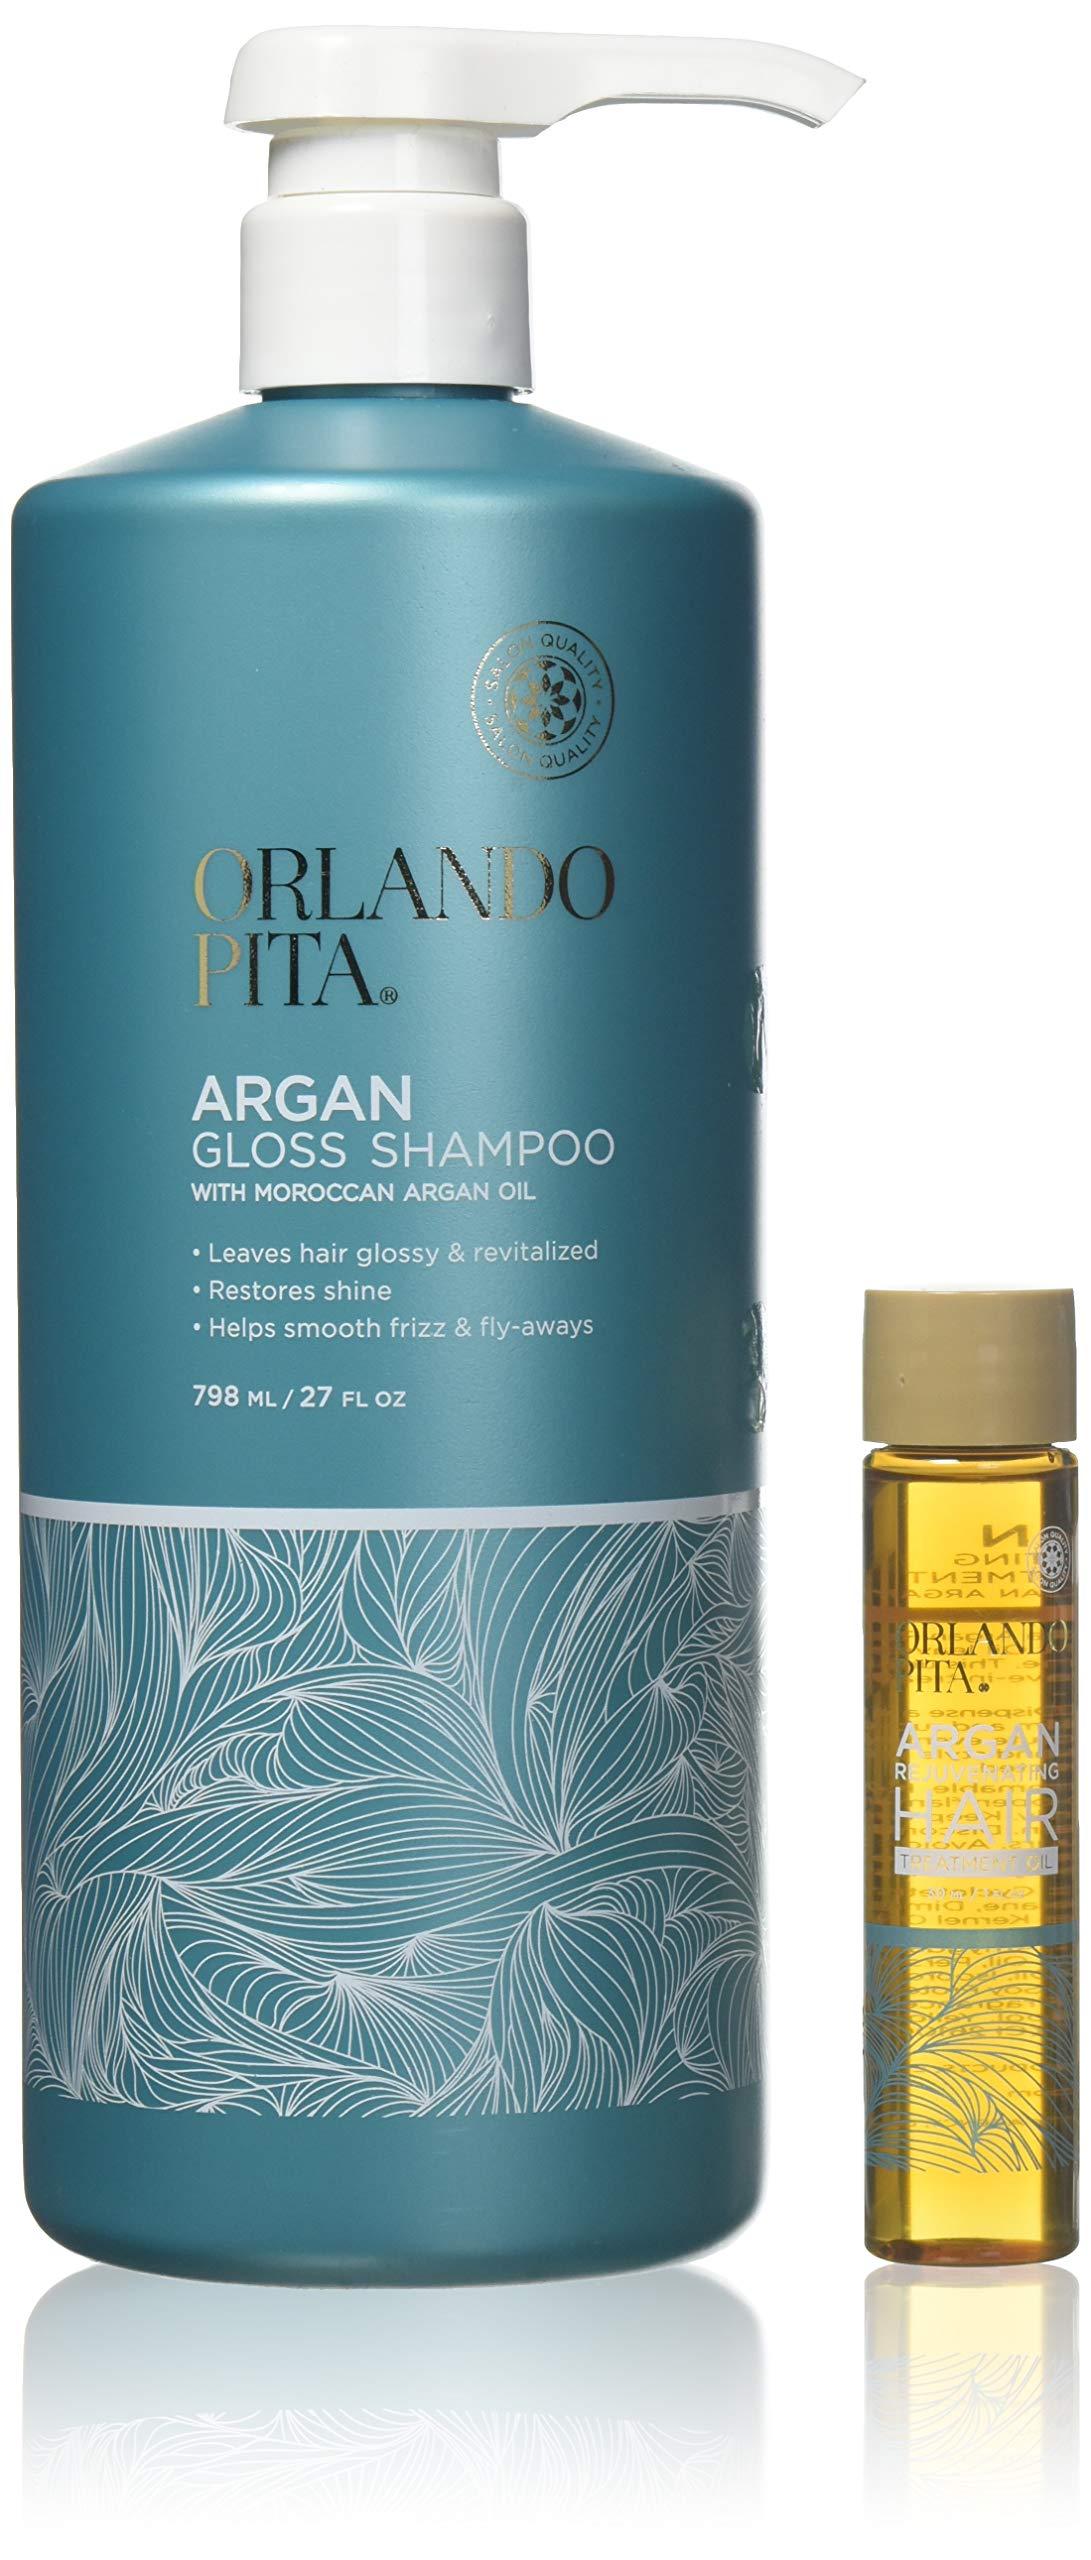 Orlando Pita Argan Gloss Shampoo with Moroccan Argan Oil Salon-Quality by Orlando Pita